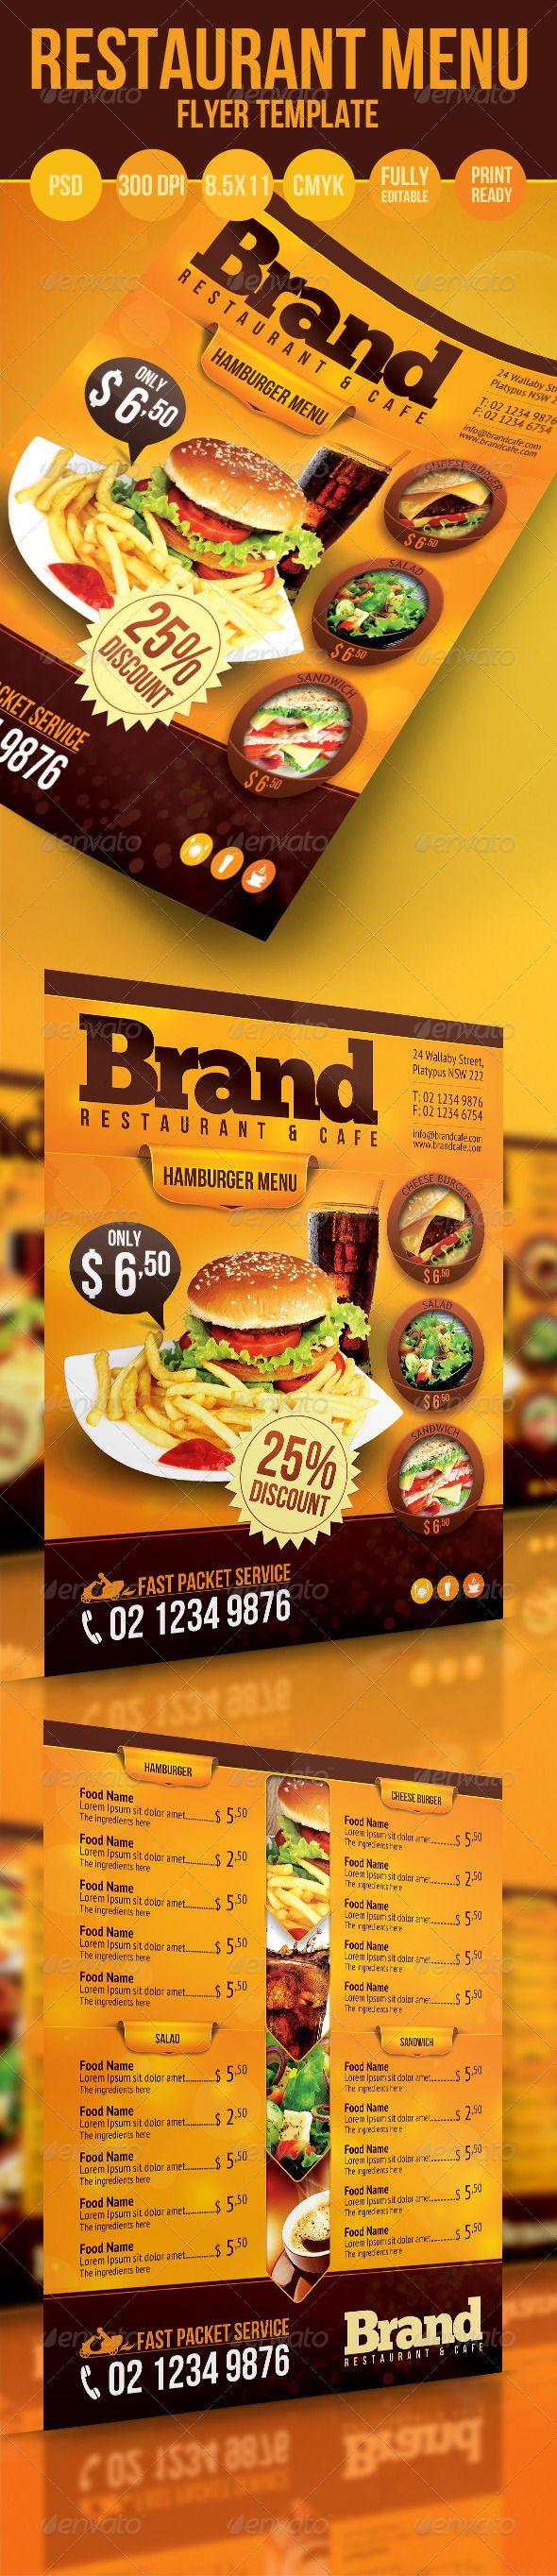 restaurant menu flyer menu pinterest menu restaurant menu